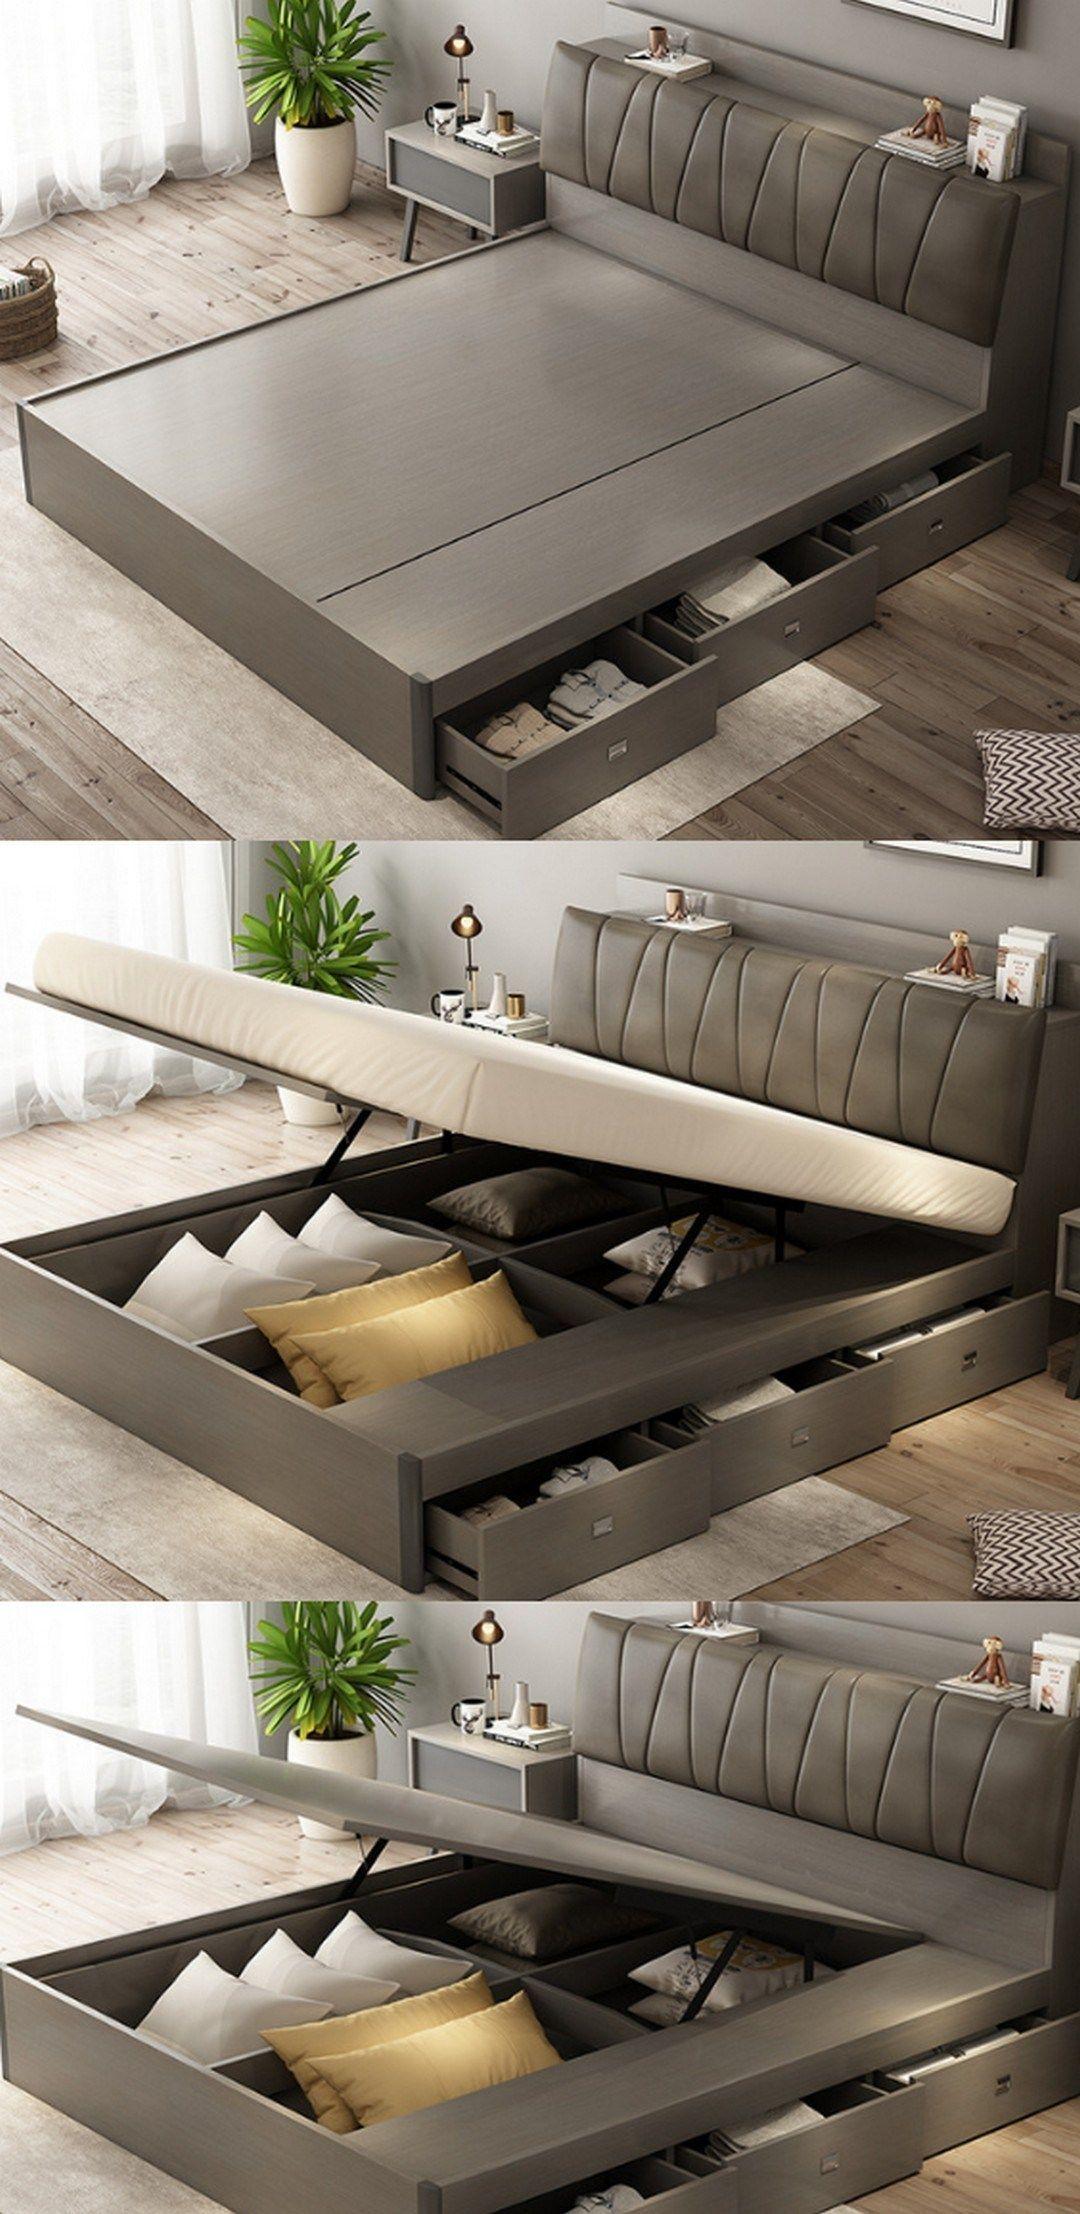 63 Awesome Double Bed Idea – Farmhouse Room